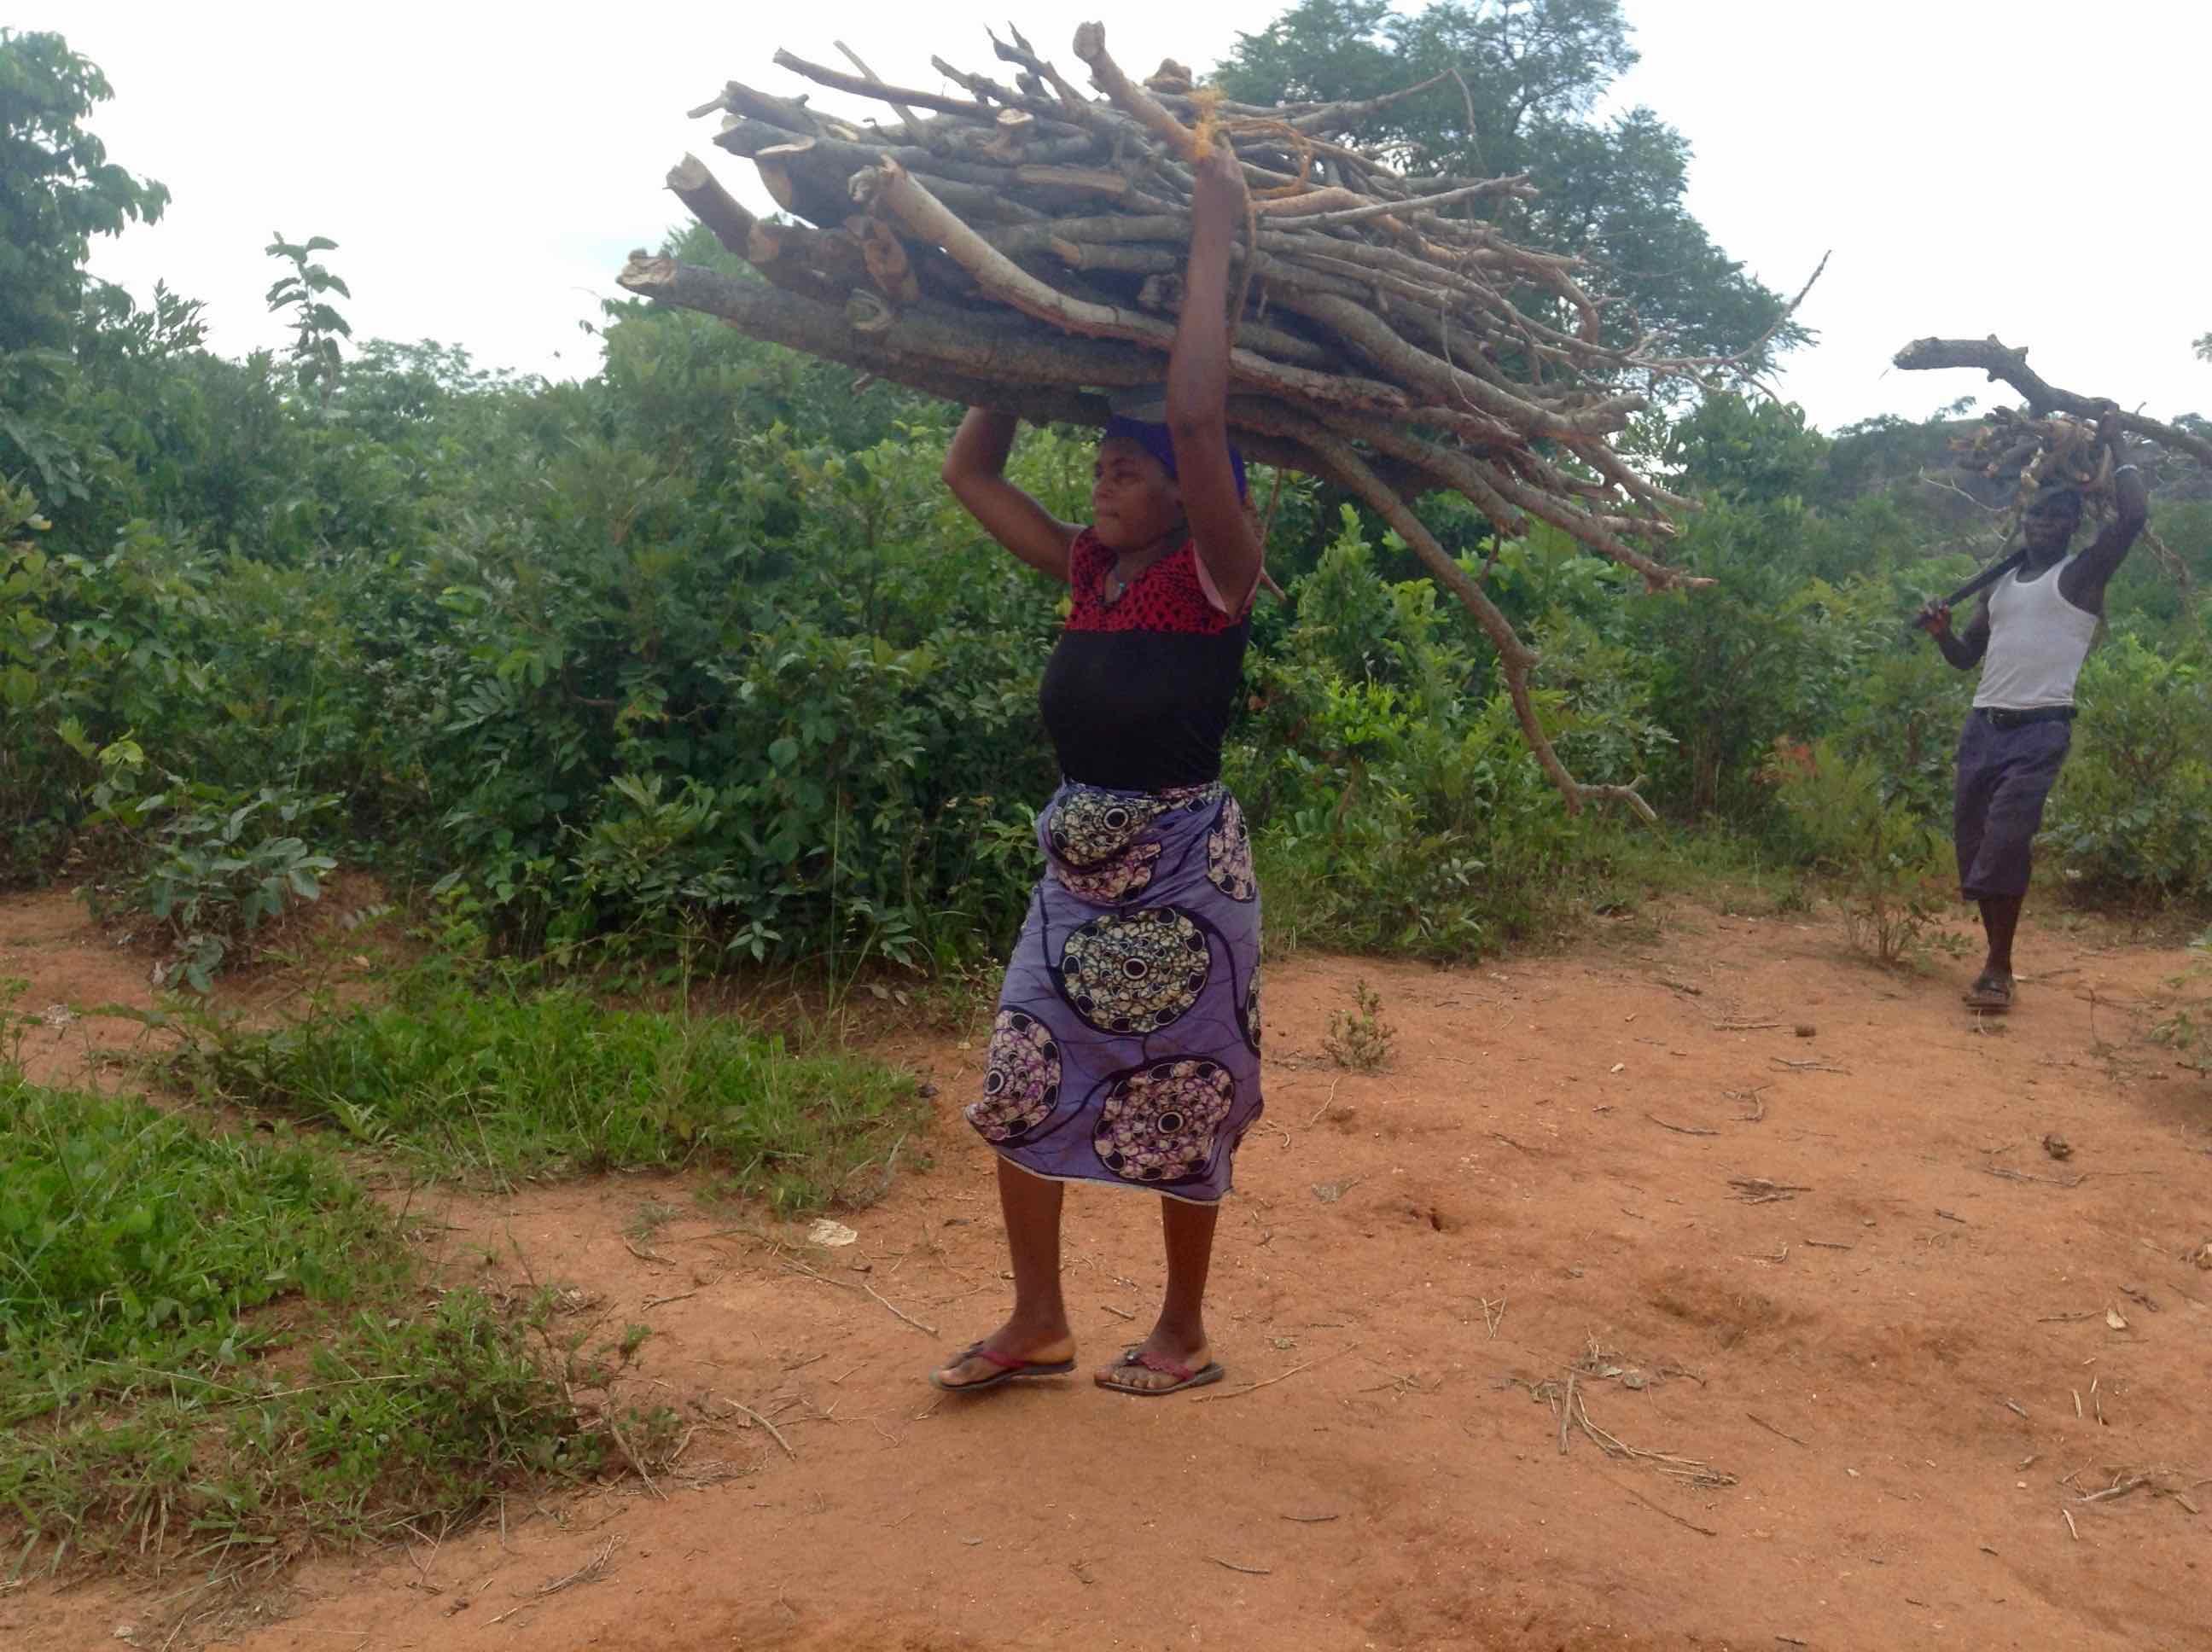 Gbagyi Woman and man fetching firewood in Ushafa Village, FCT, Nigeria, #JujuFilms